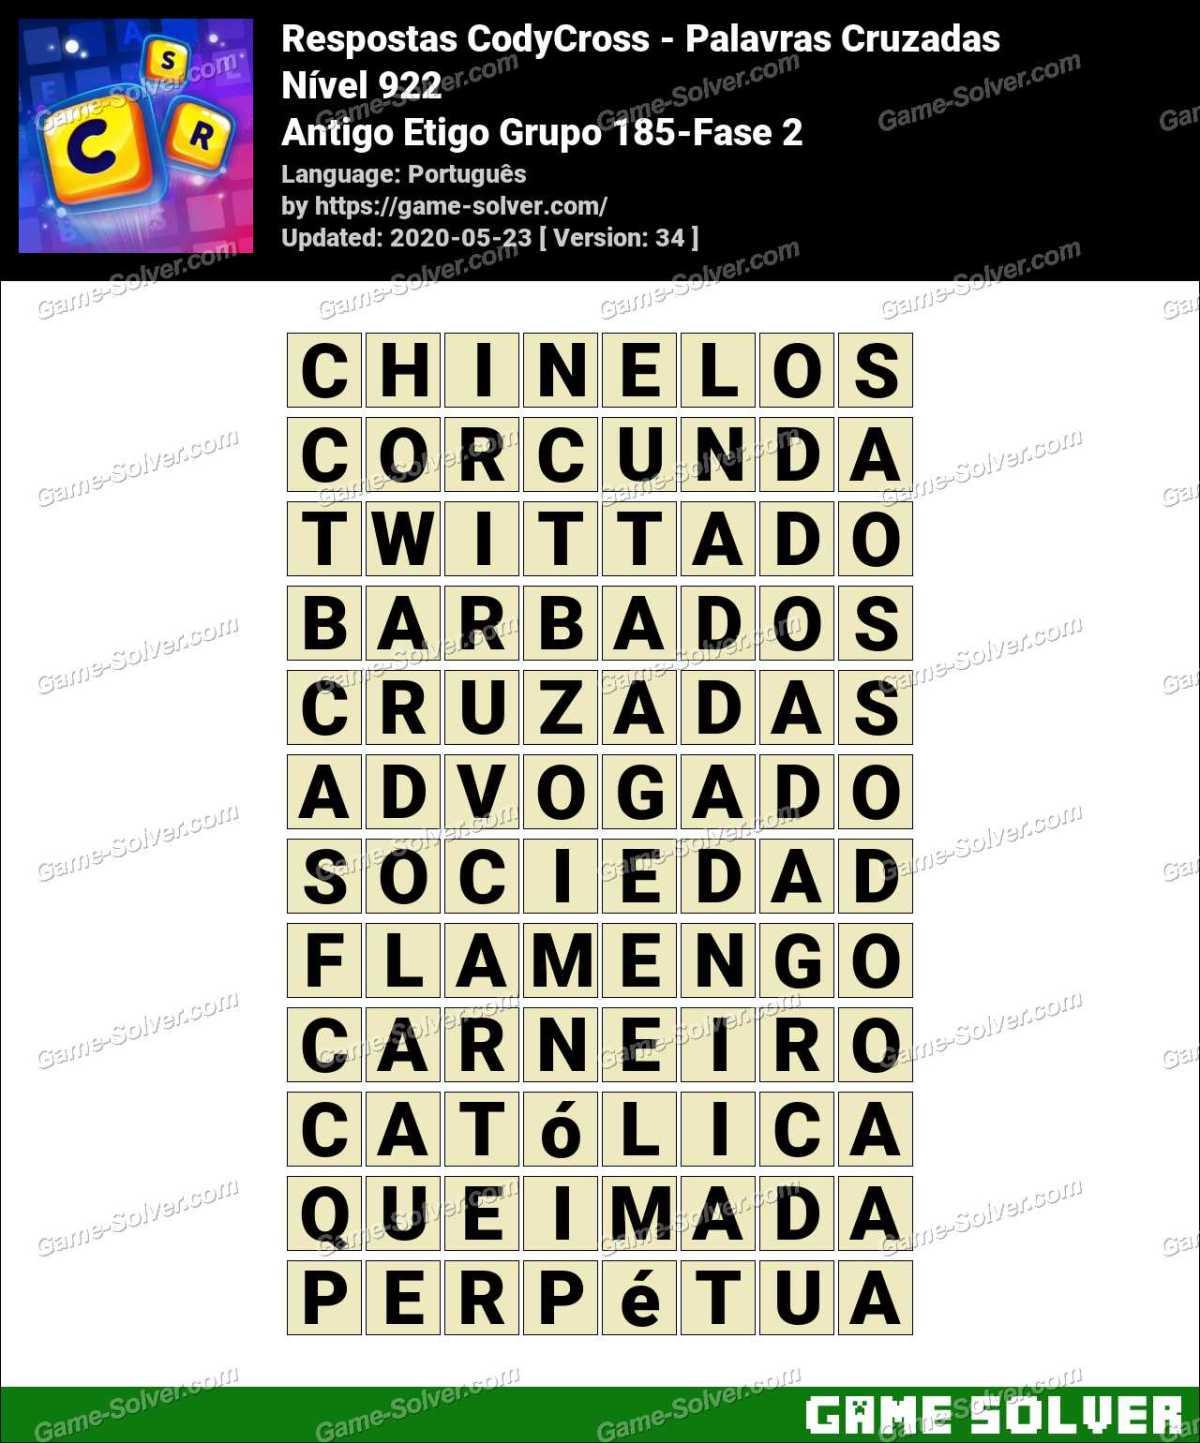 Respostas CodyCross Antigo Etigo Grupo 185-Fase 2